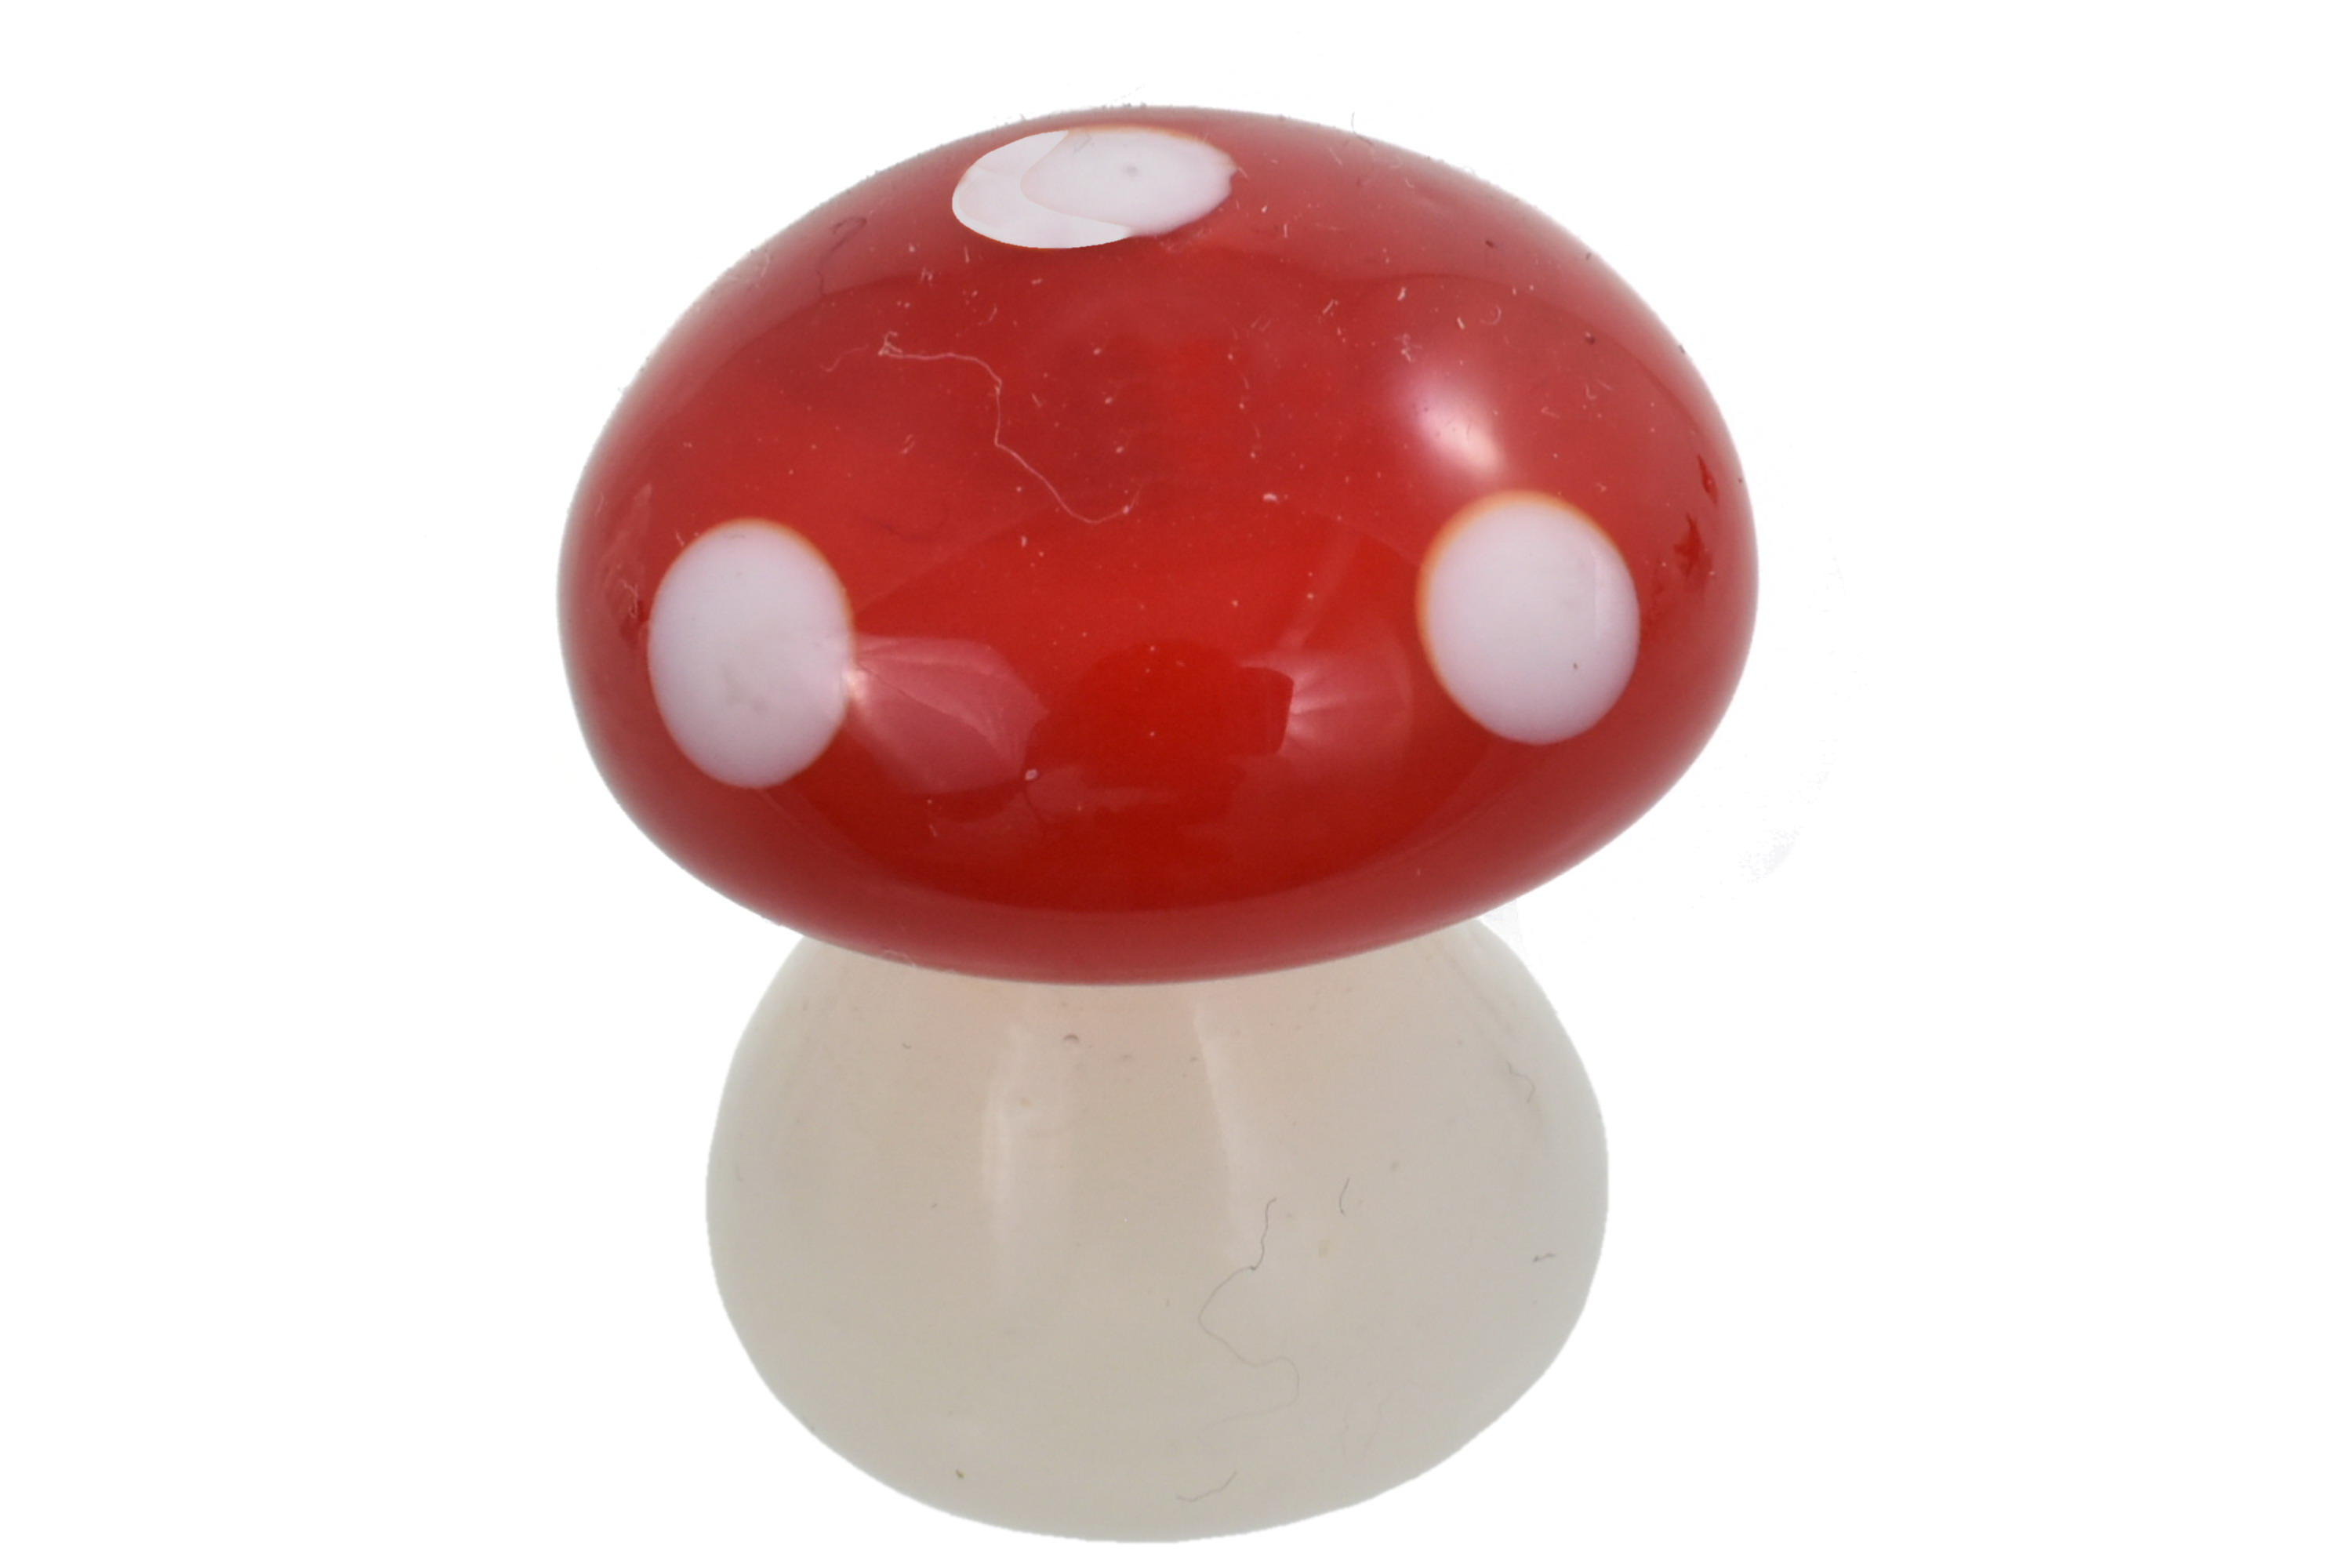 3cm Glass Mushroom Ornament